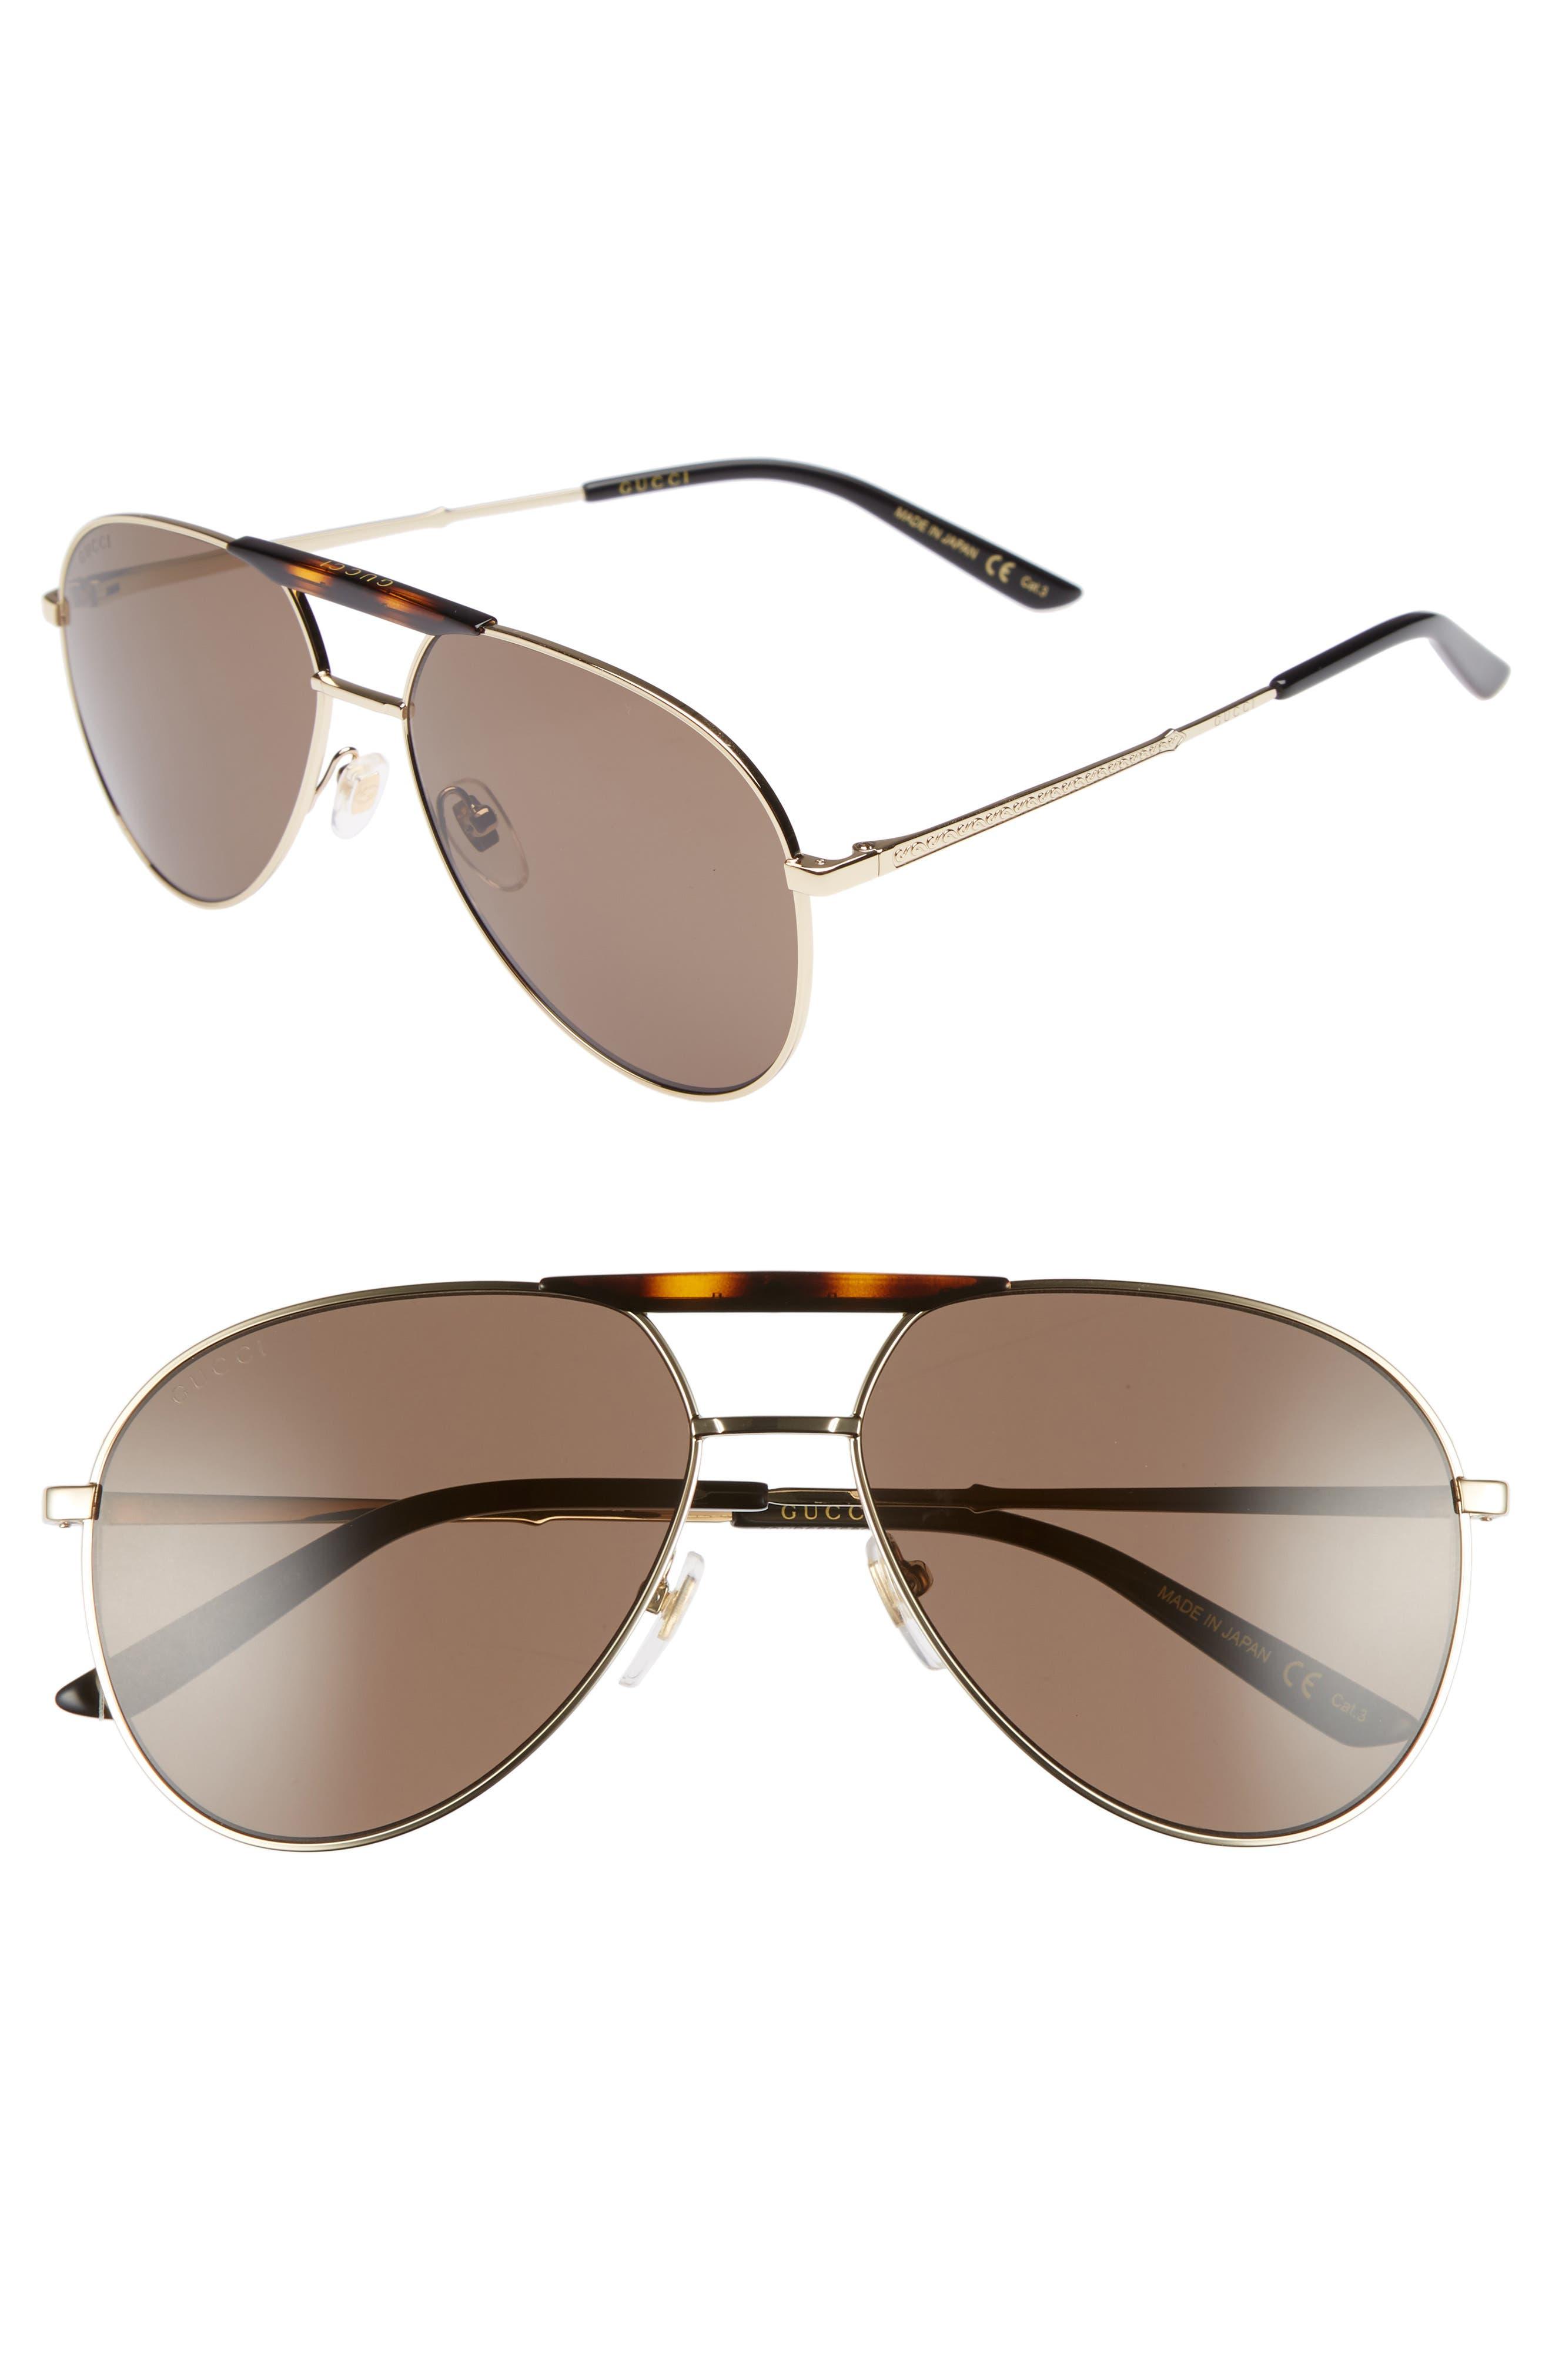 Cruise 59mm Aviator Sunglasses,                             Main thumbnail 1, color,                             GOLD/ BLACK